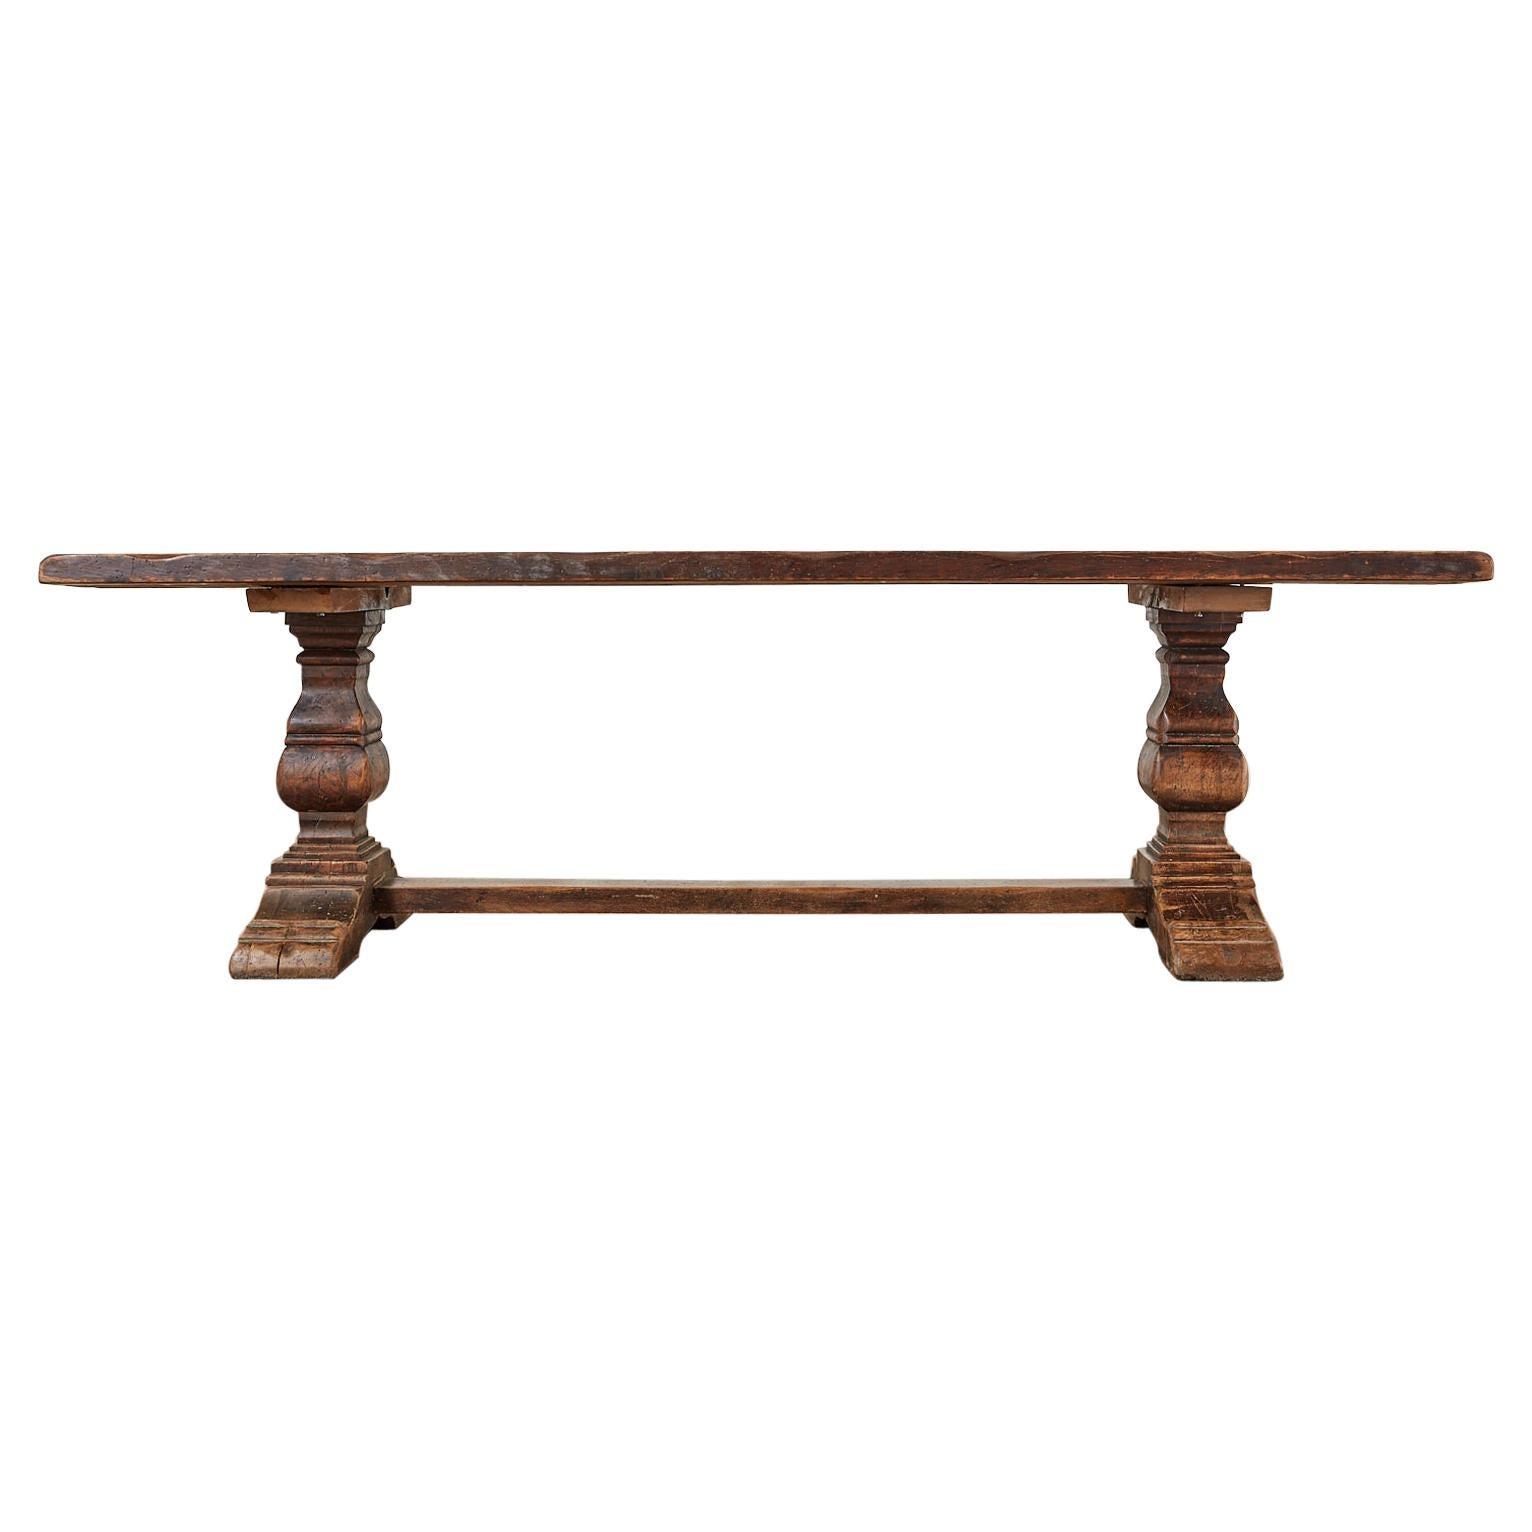 19th Century Italian Oak Farmhouse Trestle Dining Table